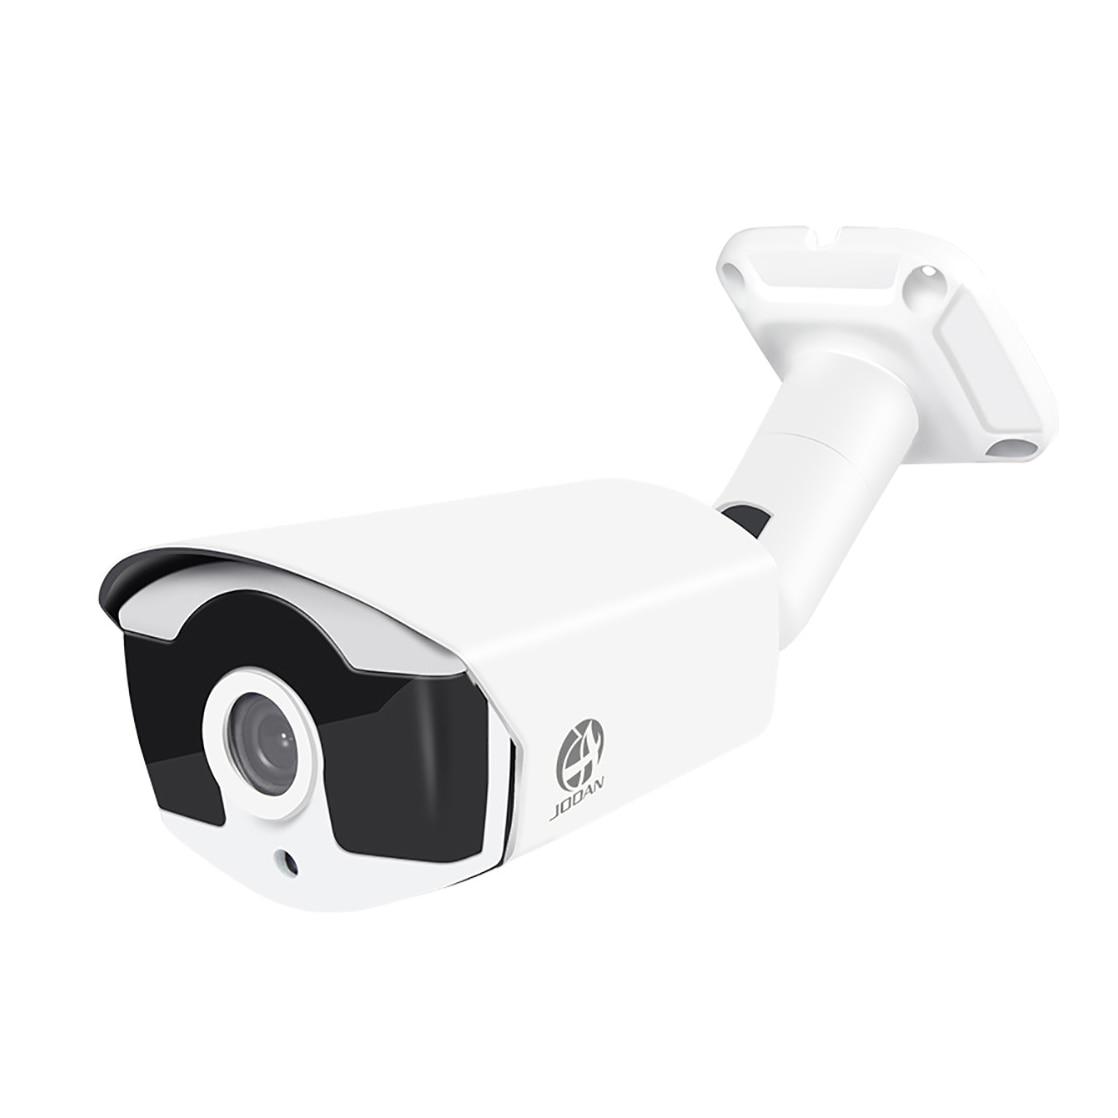 Jooan 726Grk 1080P Wifi Wireless Ip 5Mp Camera Security Home Network Video Surveillance Night-Vision Mini Cctv With Ir-Cut SmaJooan 726Grk 1080P Wifi Wireless Ip 5Mp Camera Security Home Network Video Surveillance Night-Vision Mini Cctv With Ir-Cut Sma